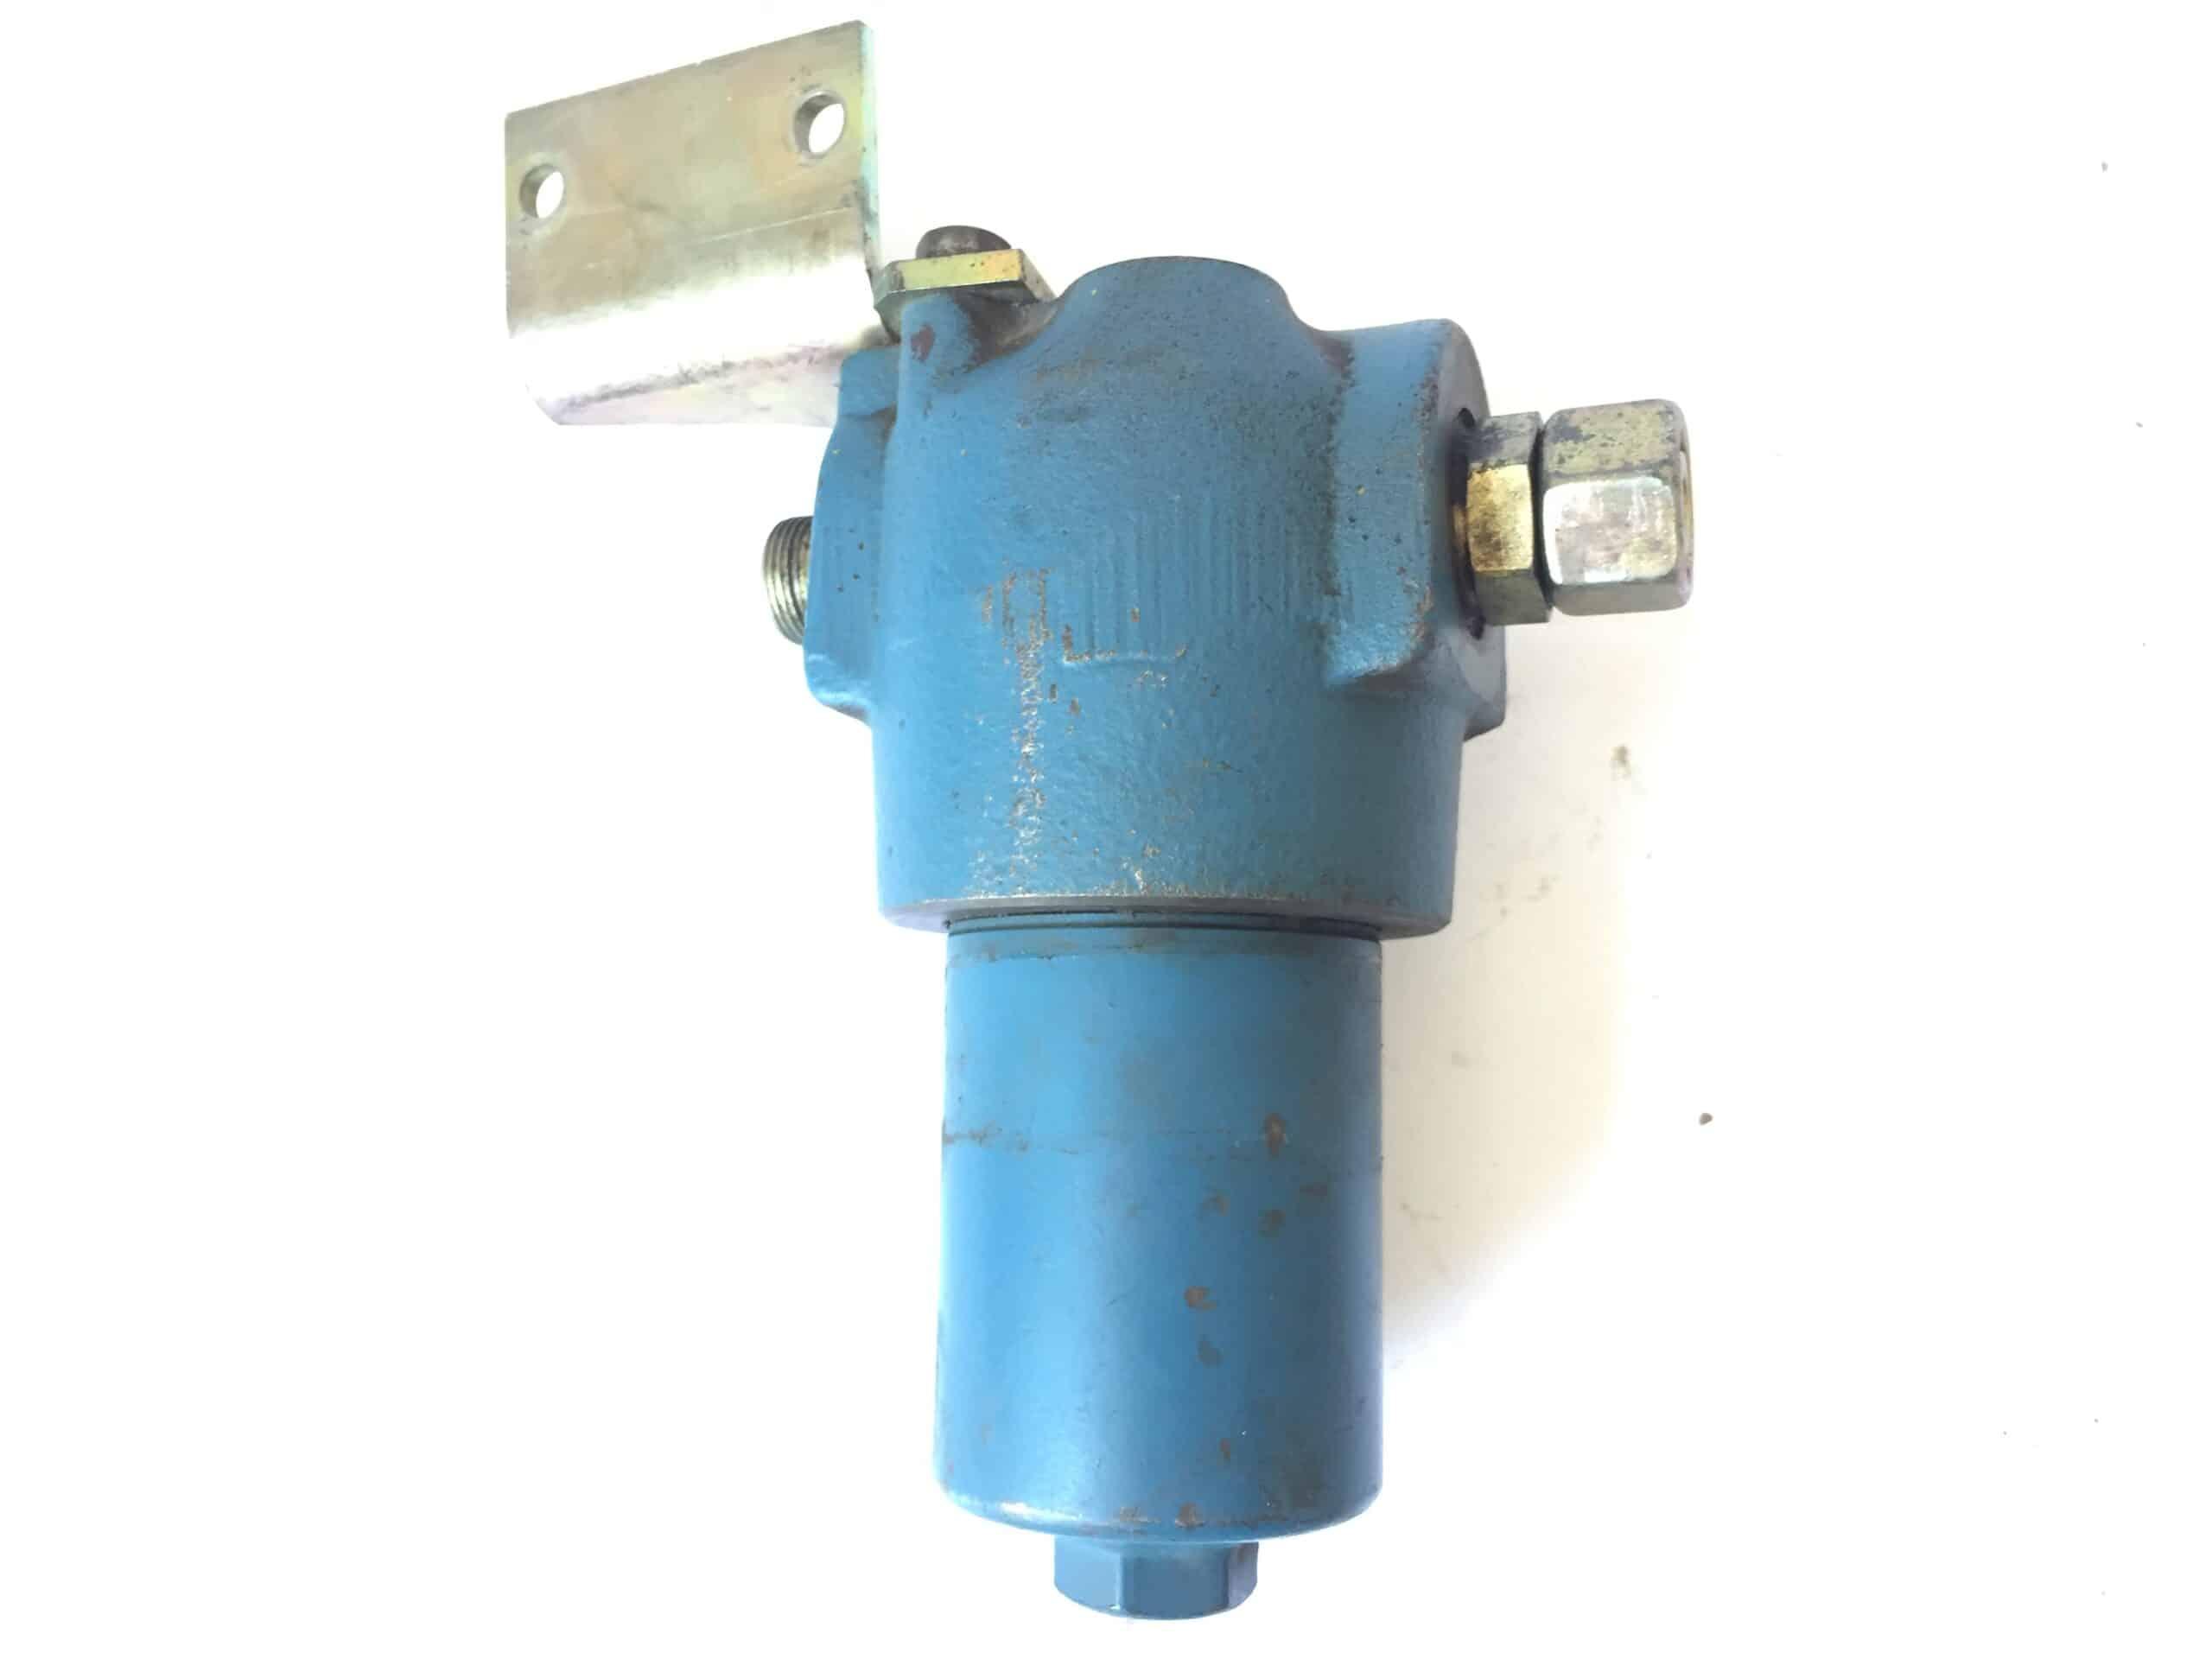   Filter insert   Fazl-e-Rasheed and Company August 2021